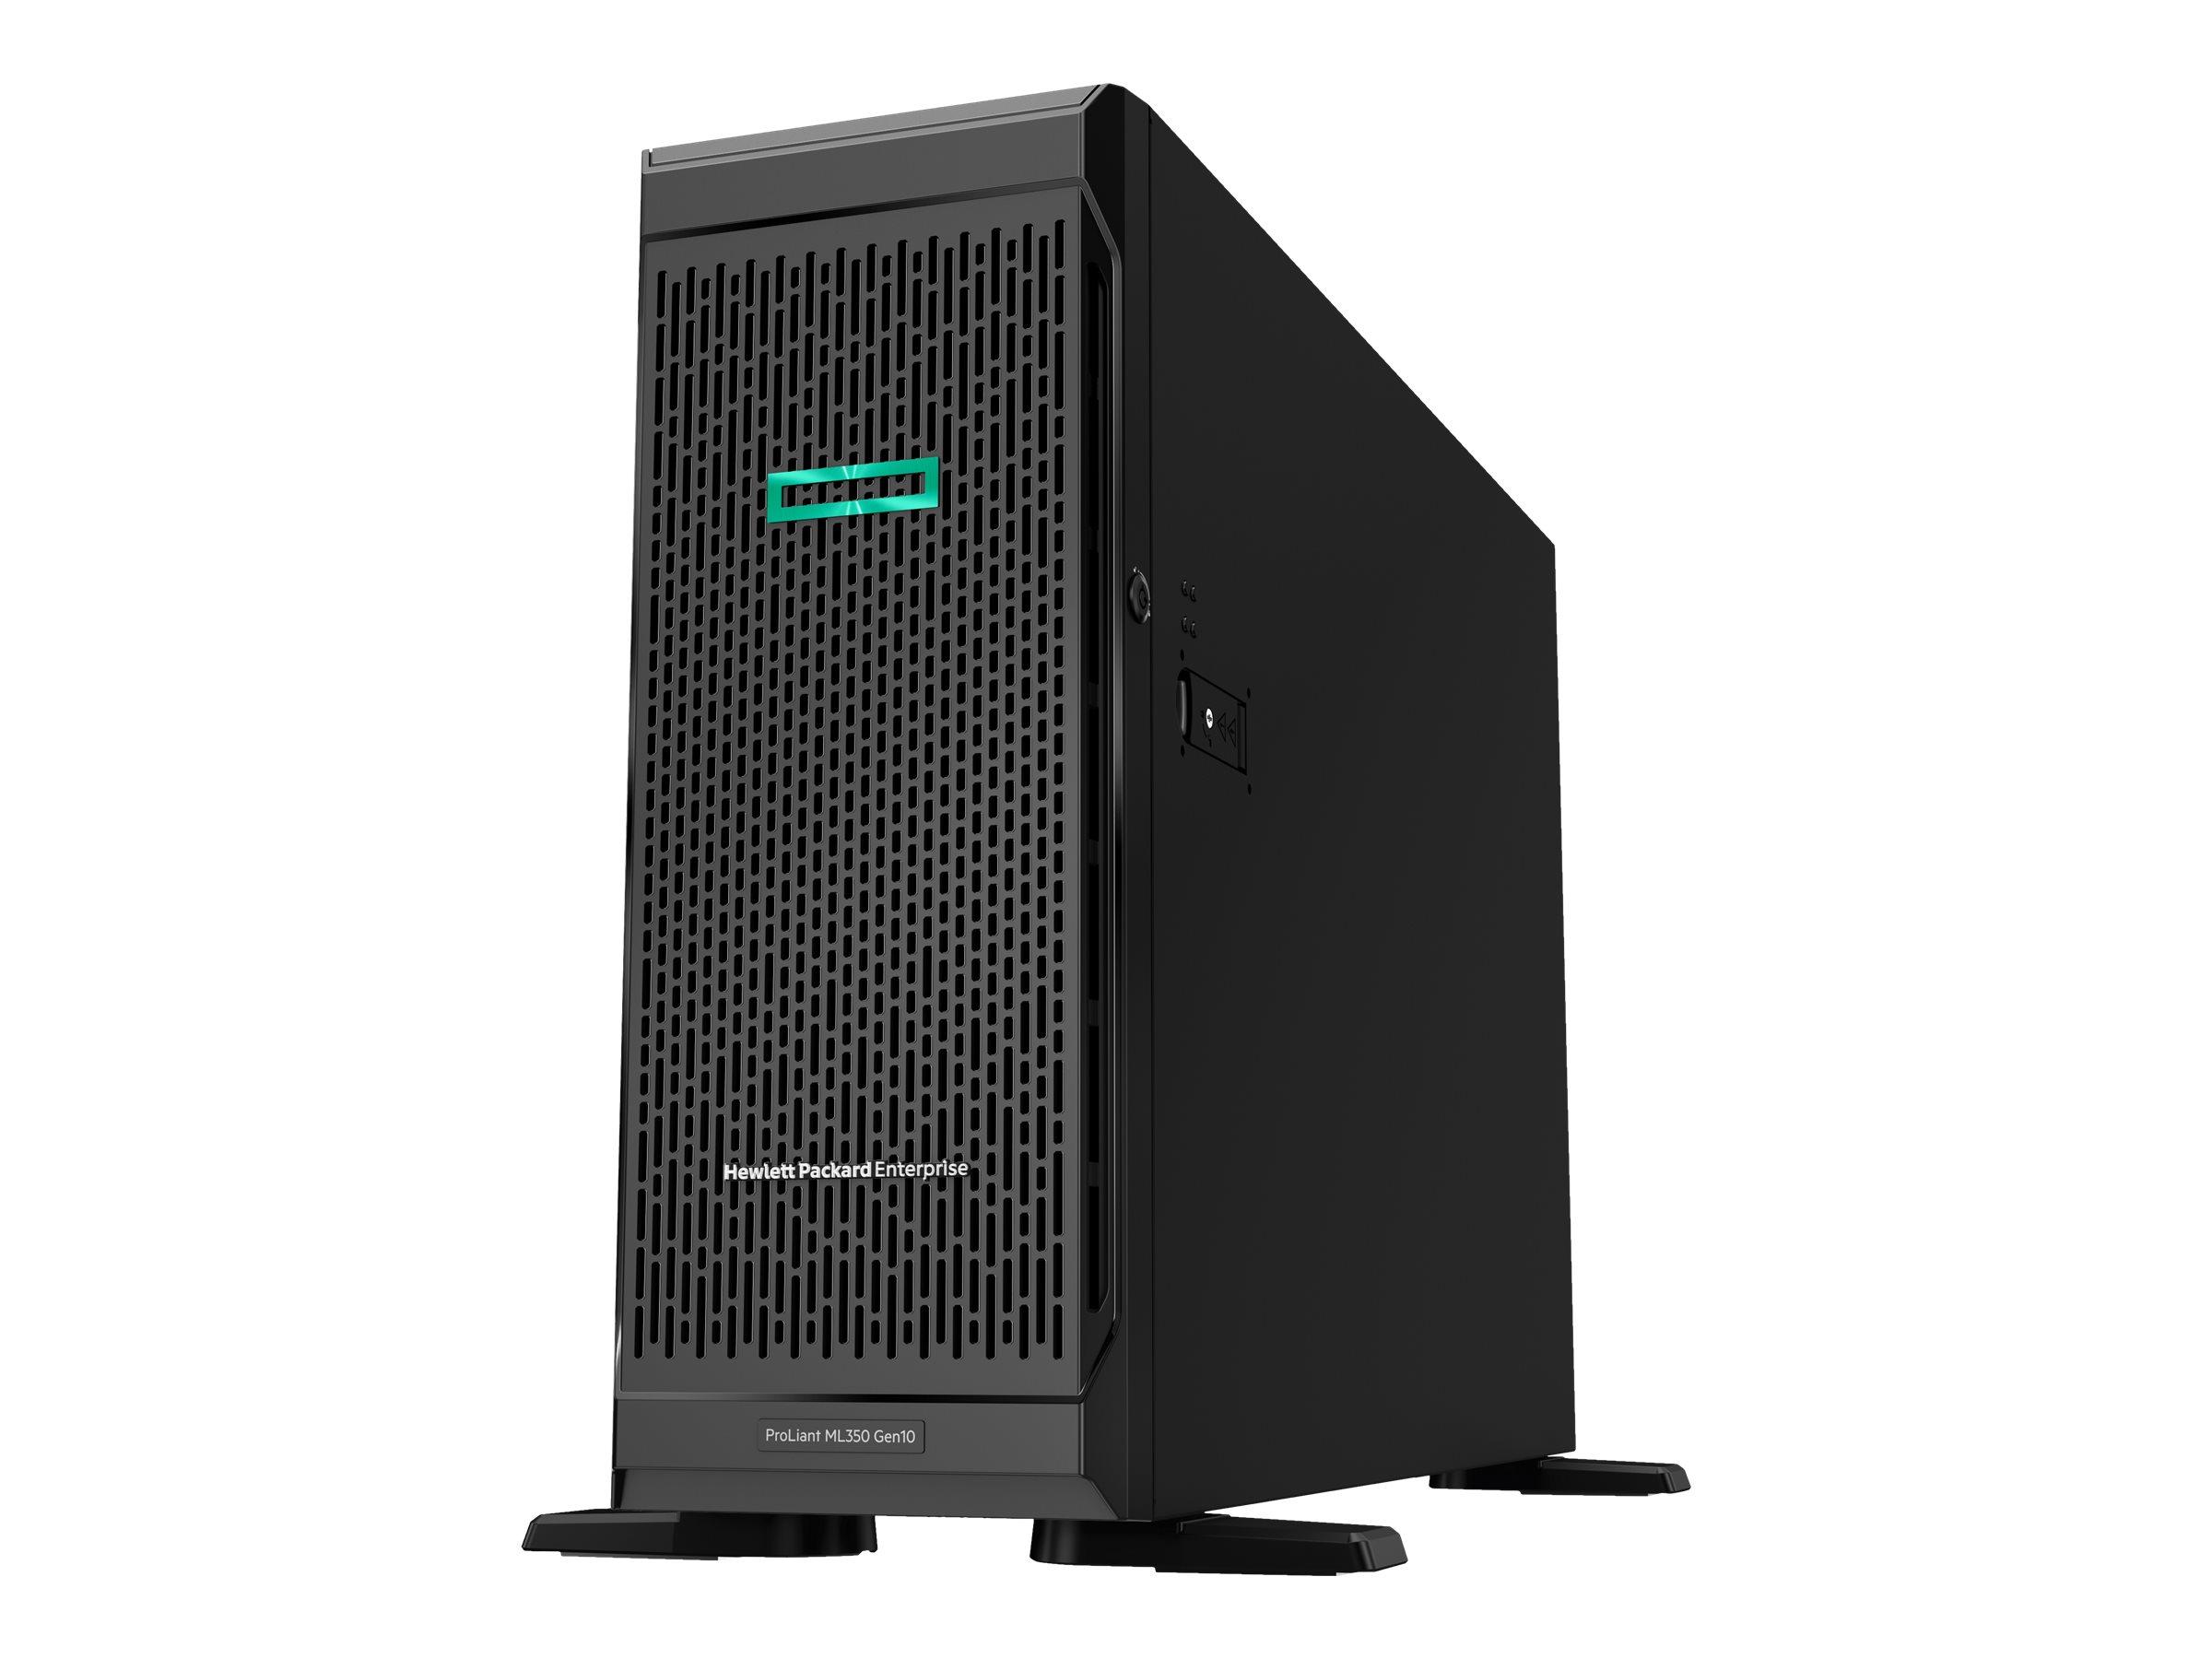 HPE ProLiant ML350 Gen10 Entry - Server - Tower - 4U - zweiweg - 1 x Xeon Bronze 3106 / 1.7 GHz